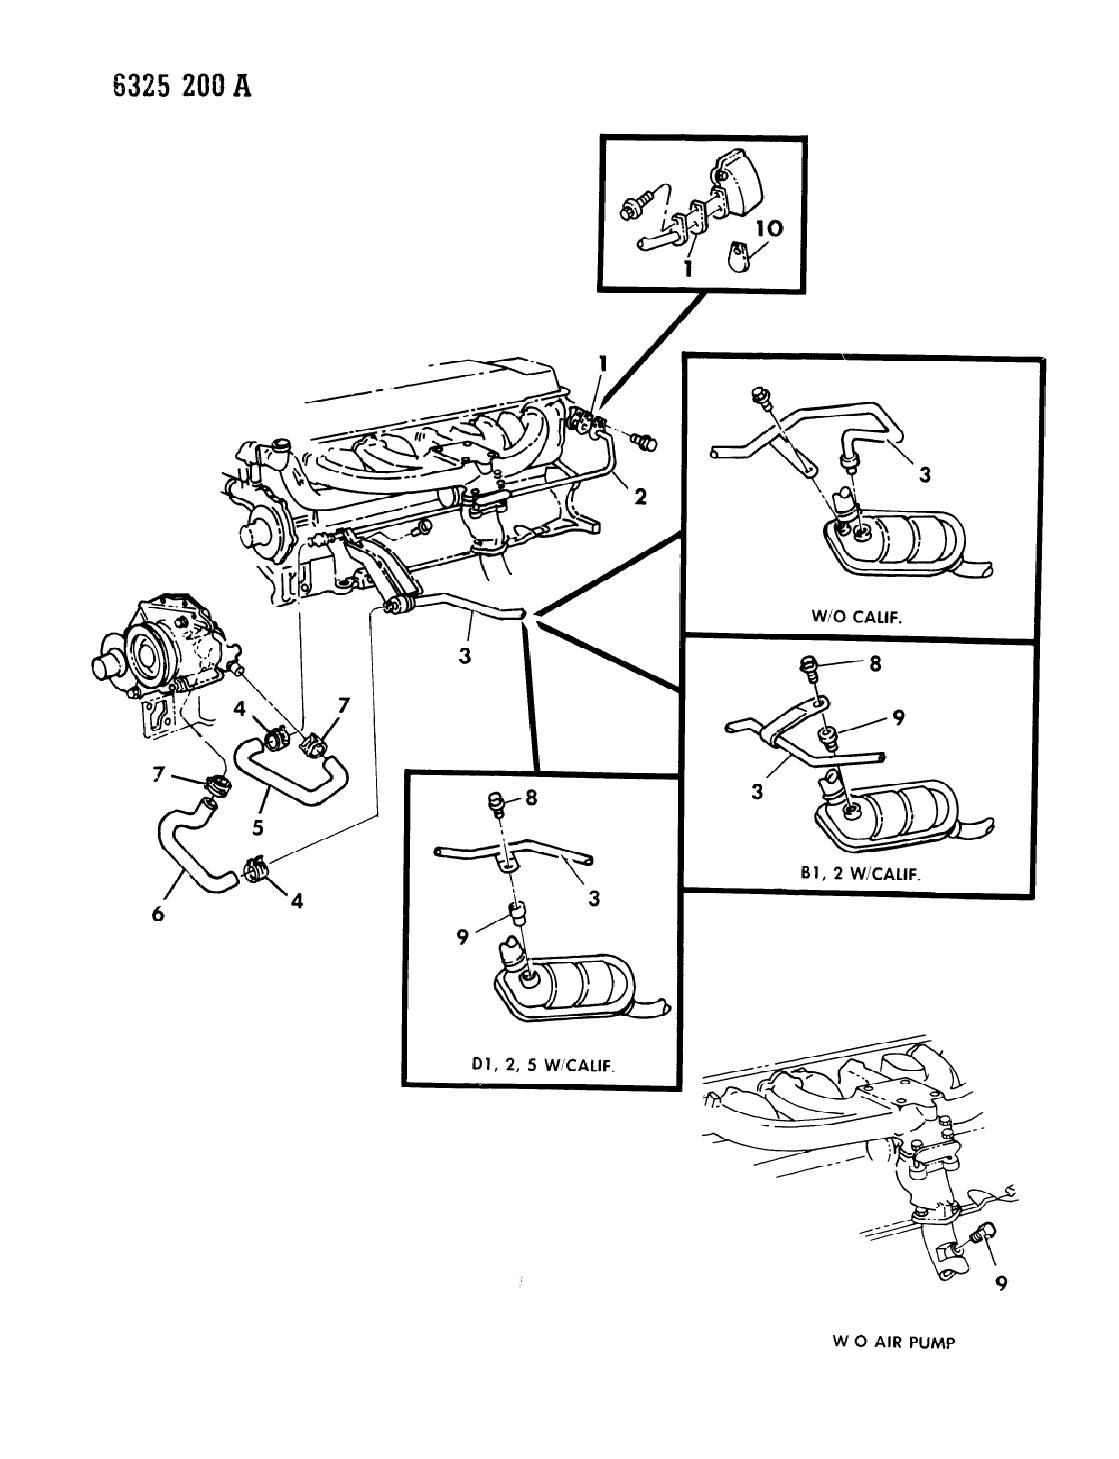 1987 Dodge Ram Van Air Pump Tubing Mopar Parts Giant Vanair Wiring Diagram Thumbnail 1